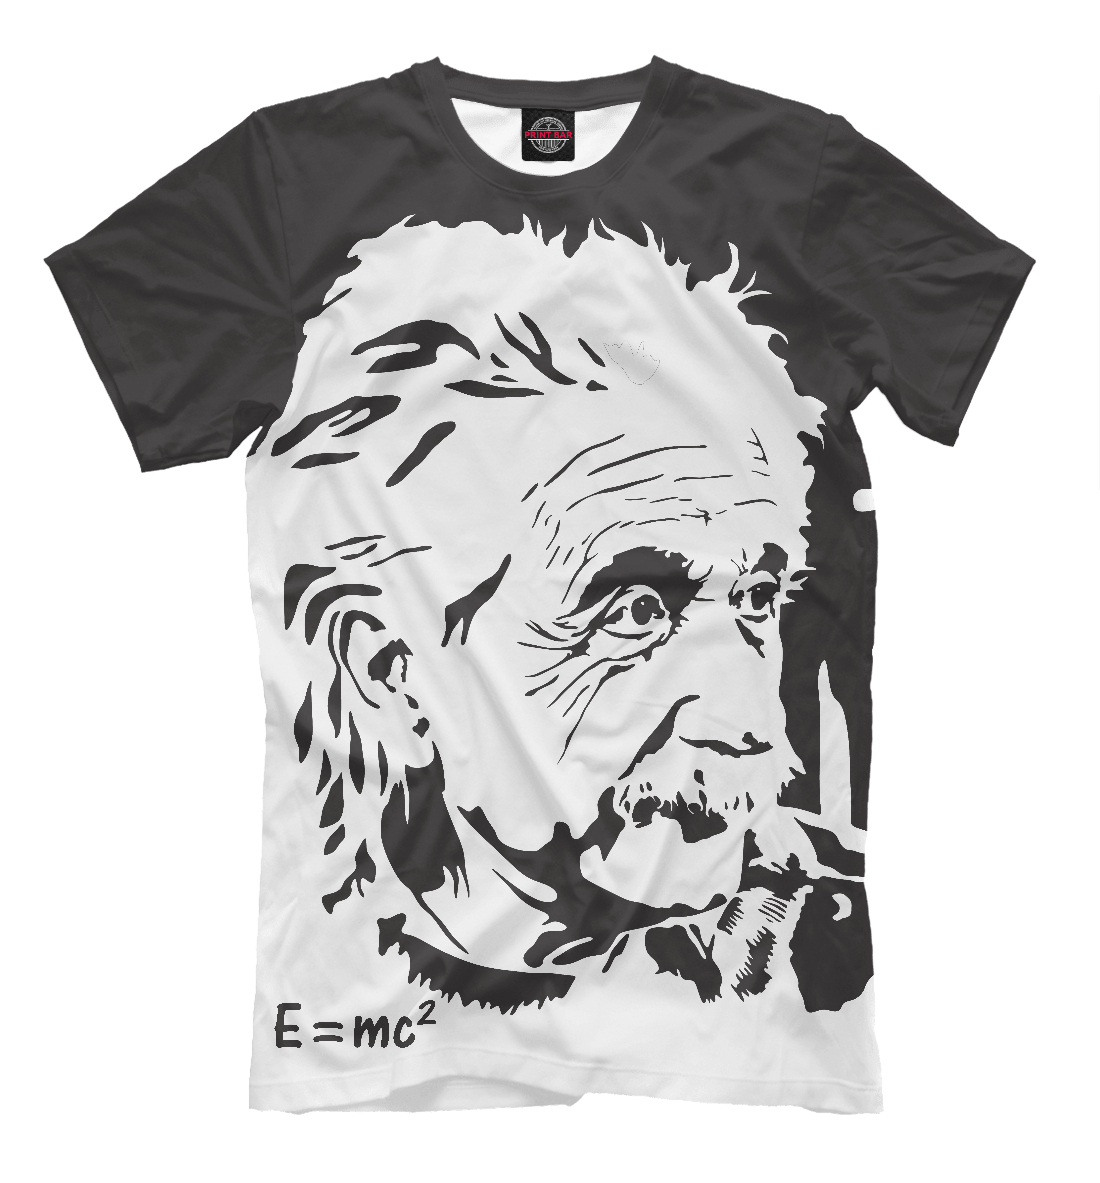 Купить Альберт Эйнштейн / Albert Einstein, Printbar, Футболки, ISR-464179-fut-2